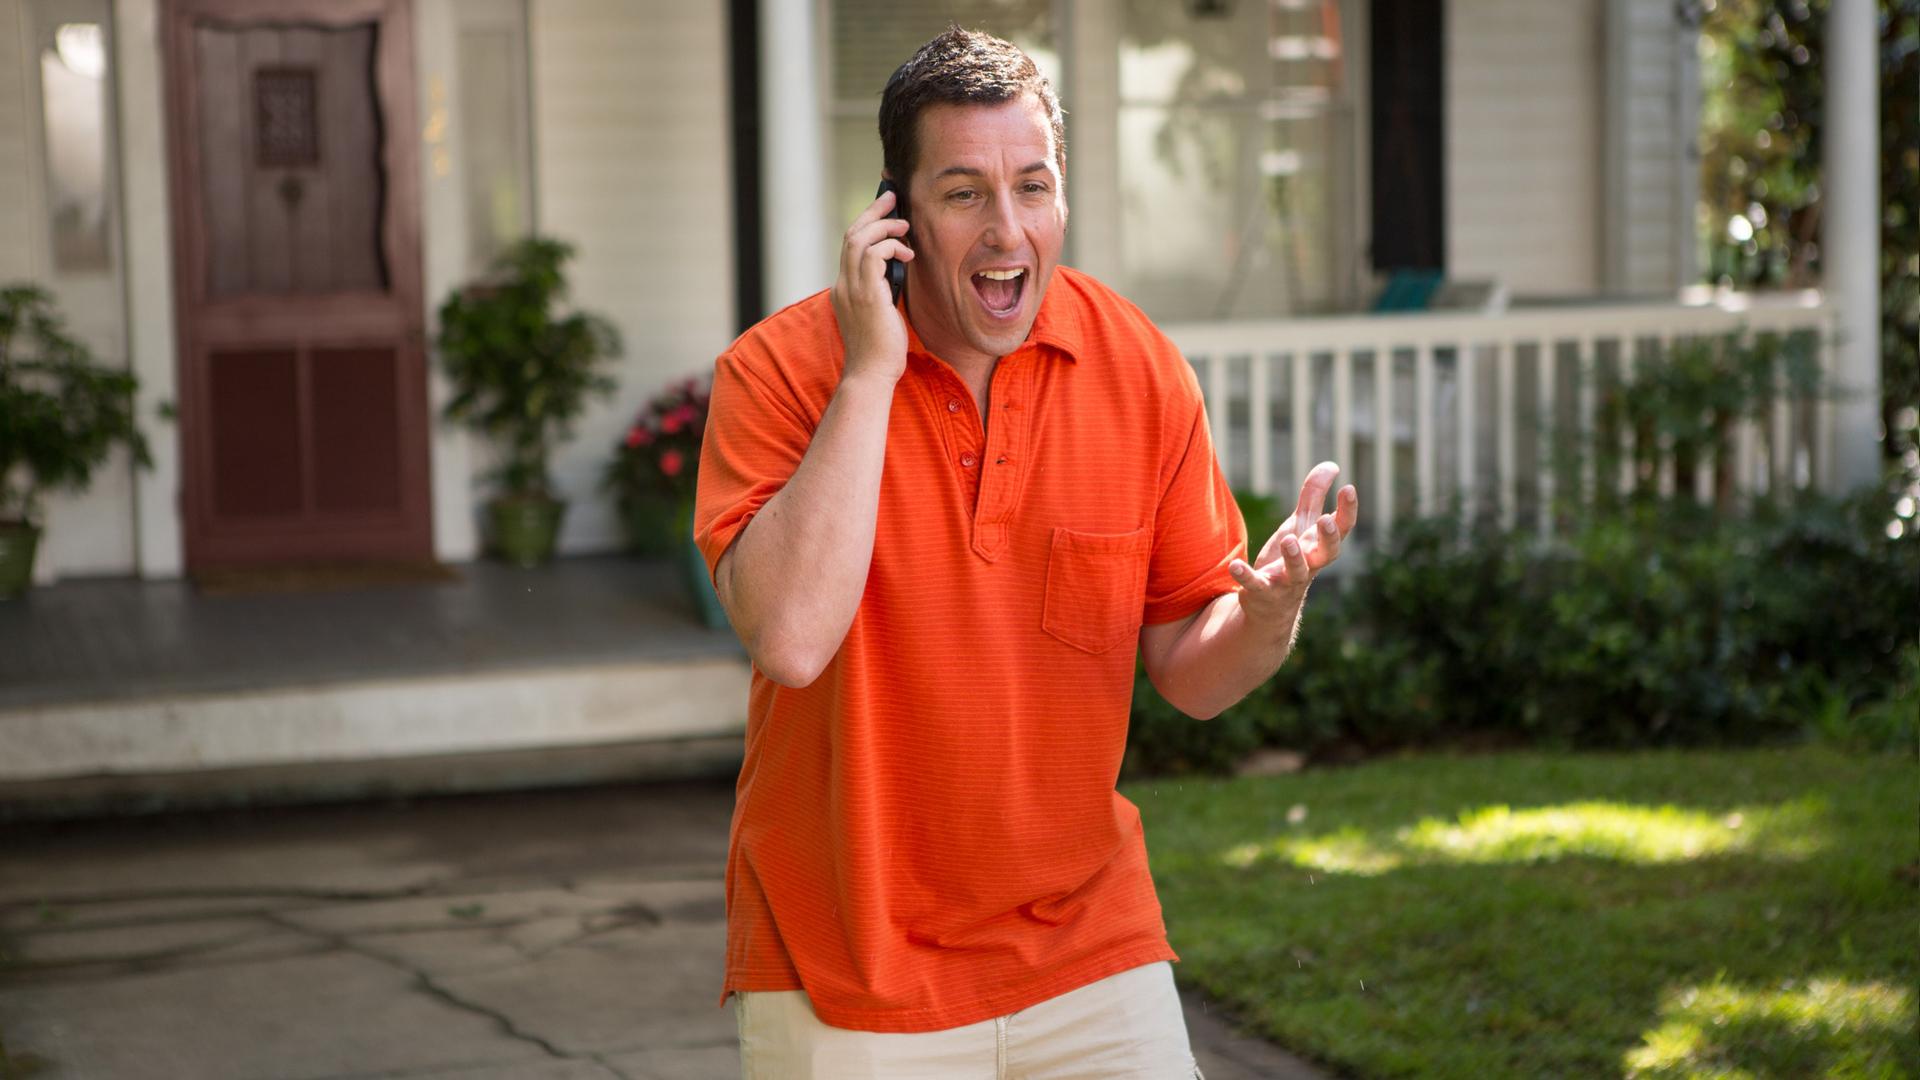 Insieme per forza: Adam Sandler nel ruolo di Jim in una scena